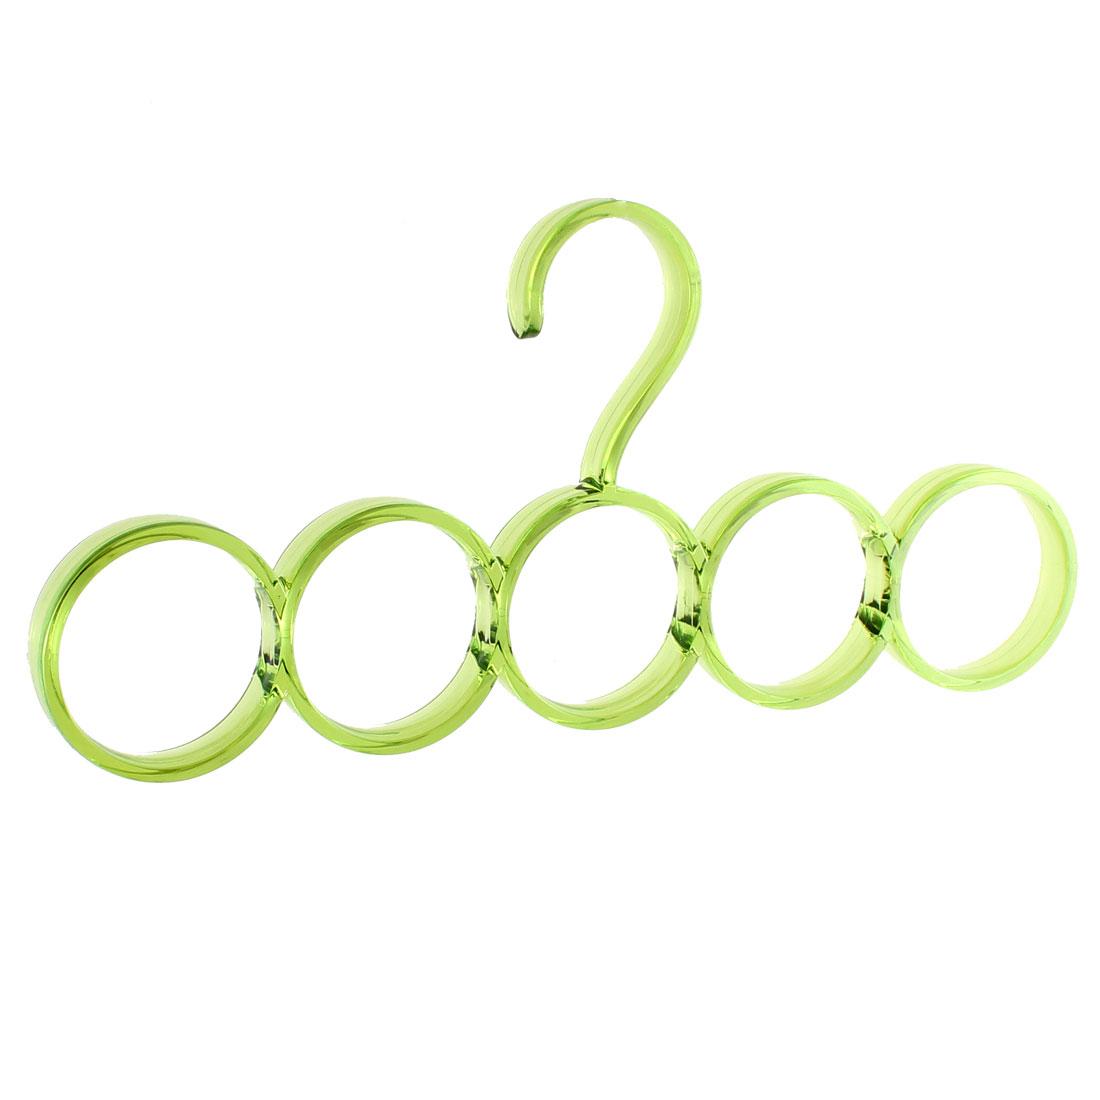 Closet Wardrobe Scarf Belt Necktie Hanging Hook Organizer Hanger 5 Rings Clear Green